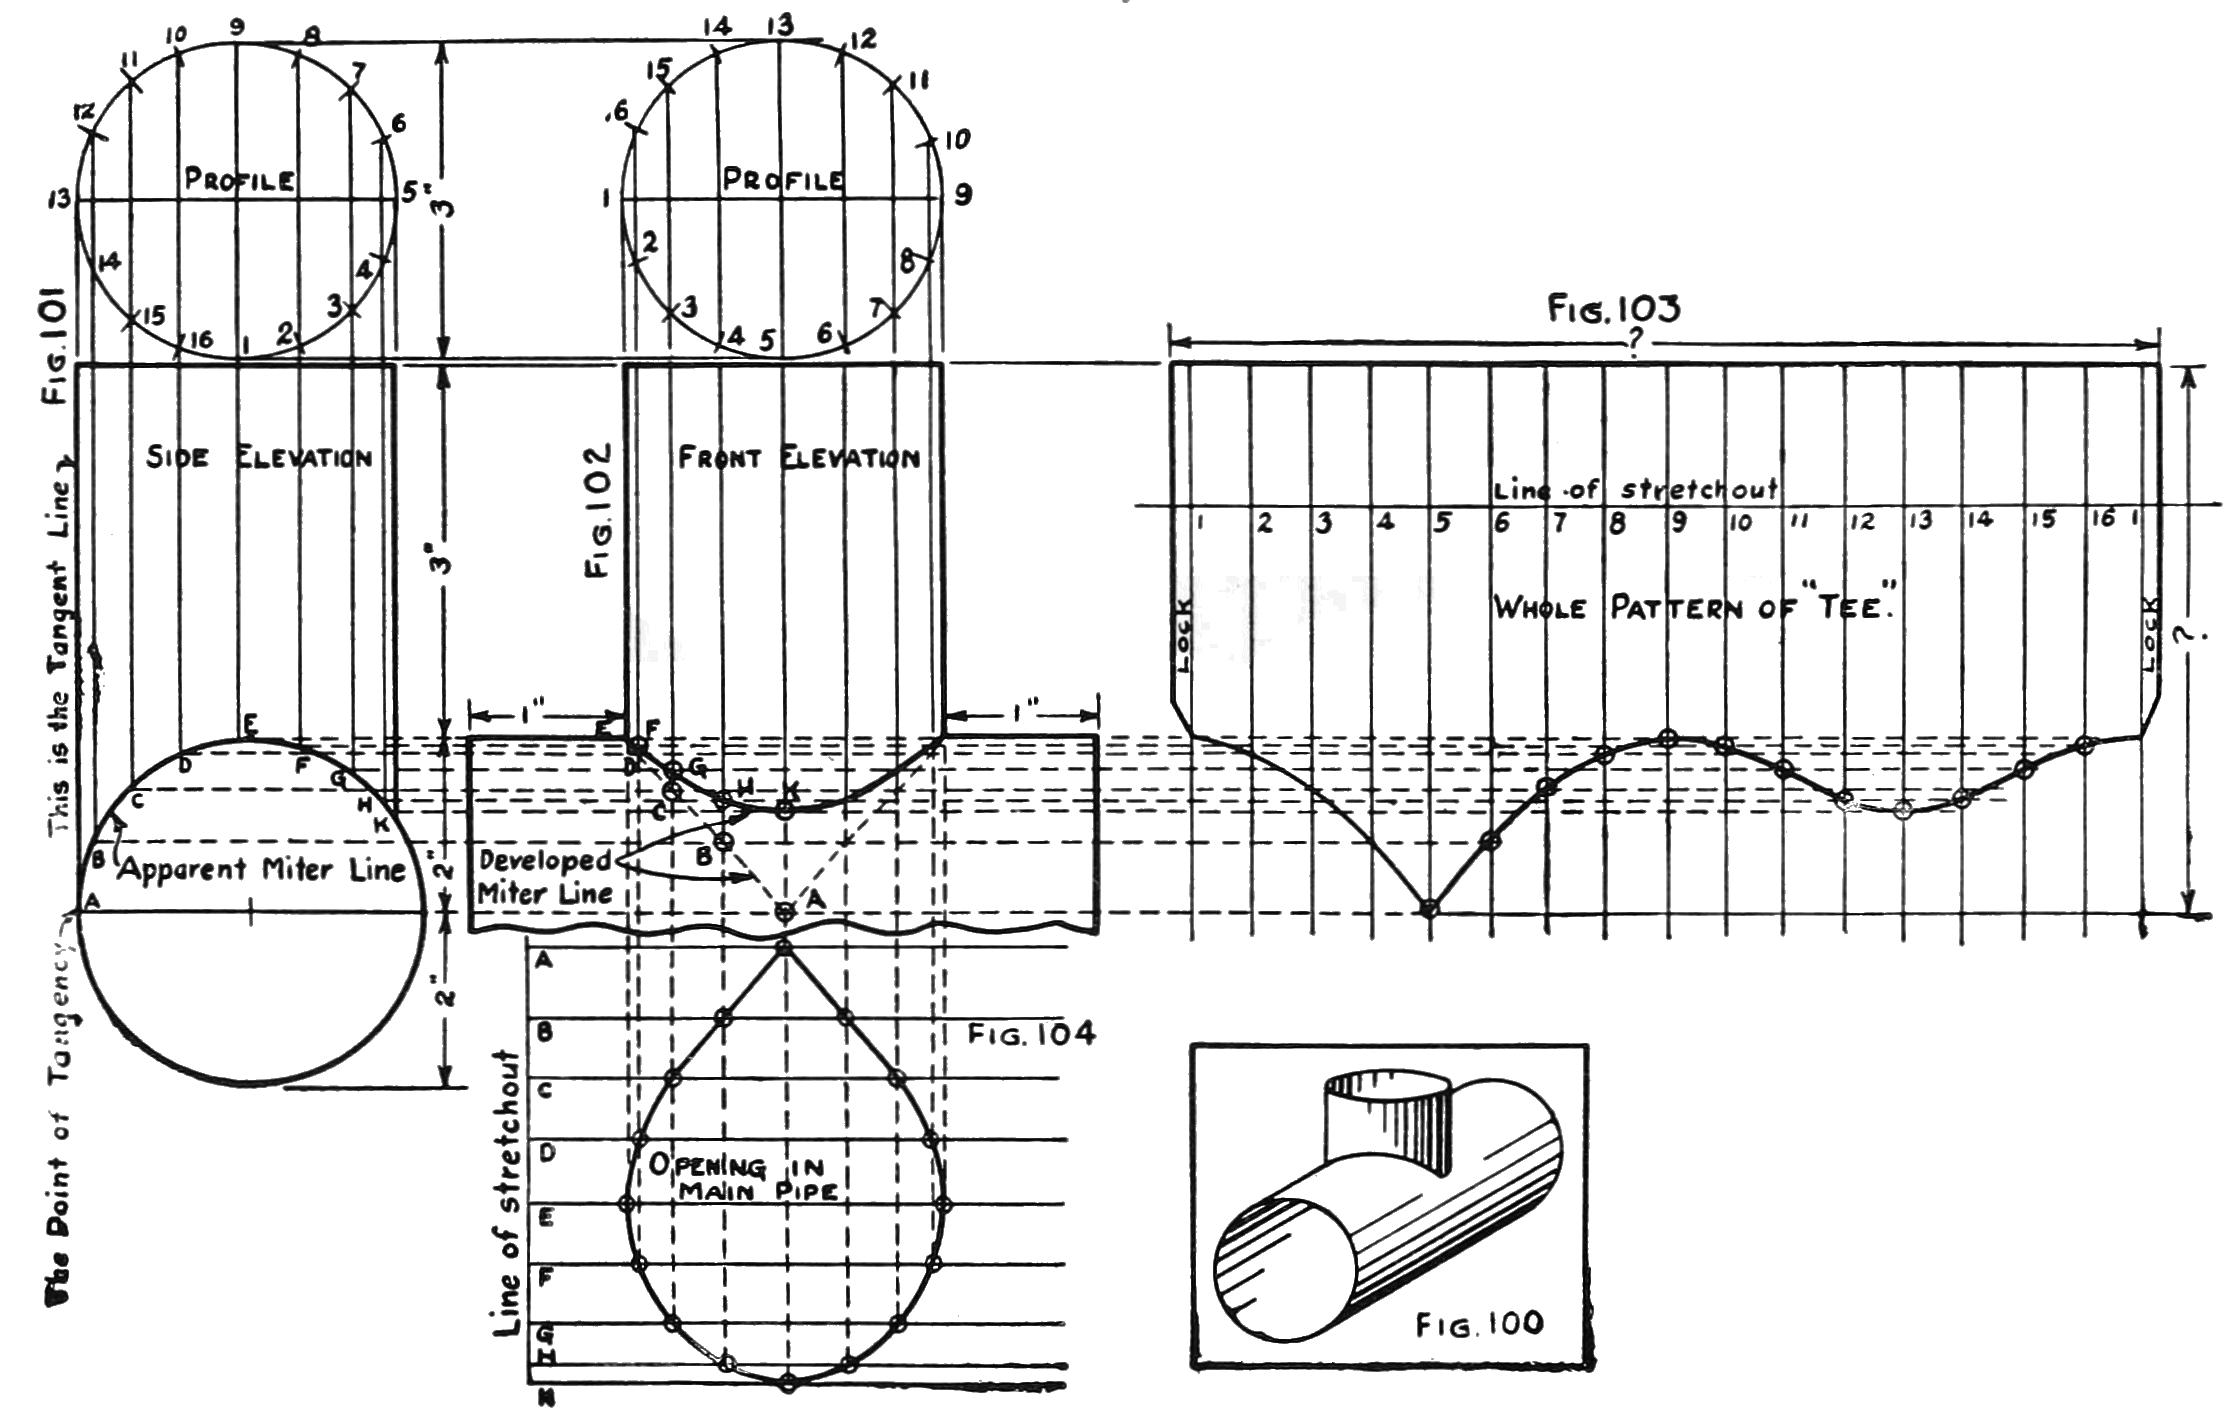 Page Sheet Metal Drafting Djvu 84 Wikisource The Free